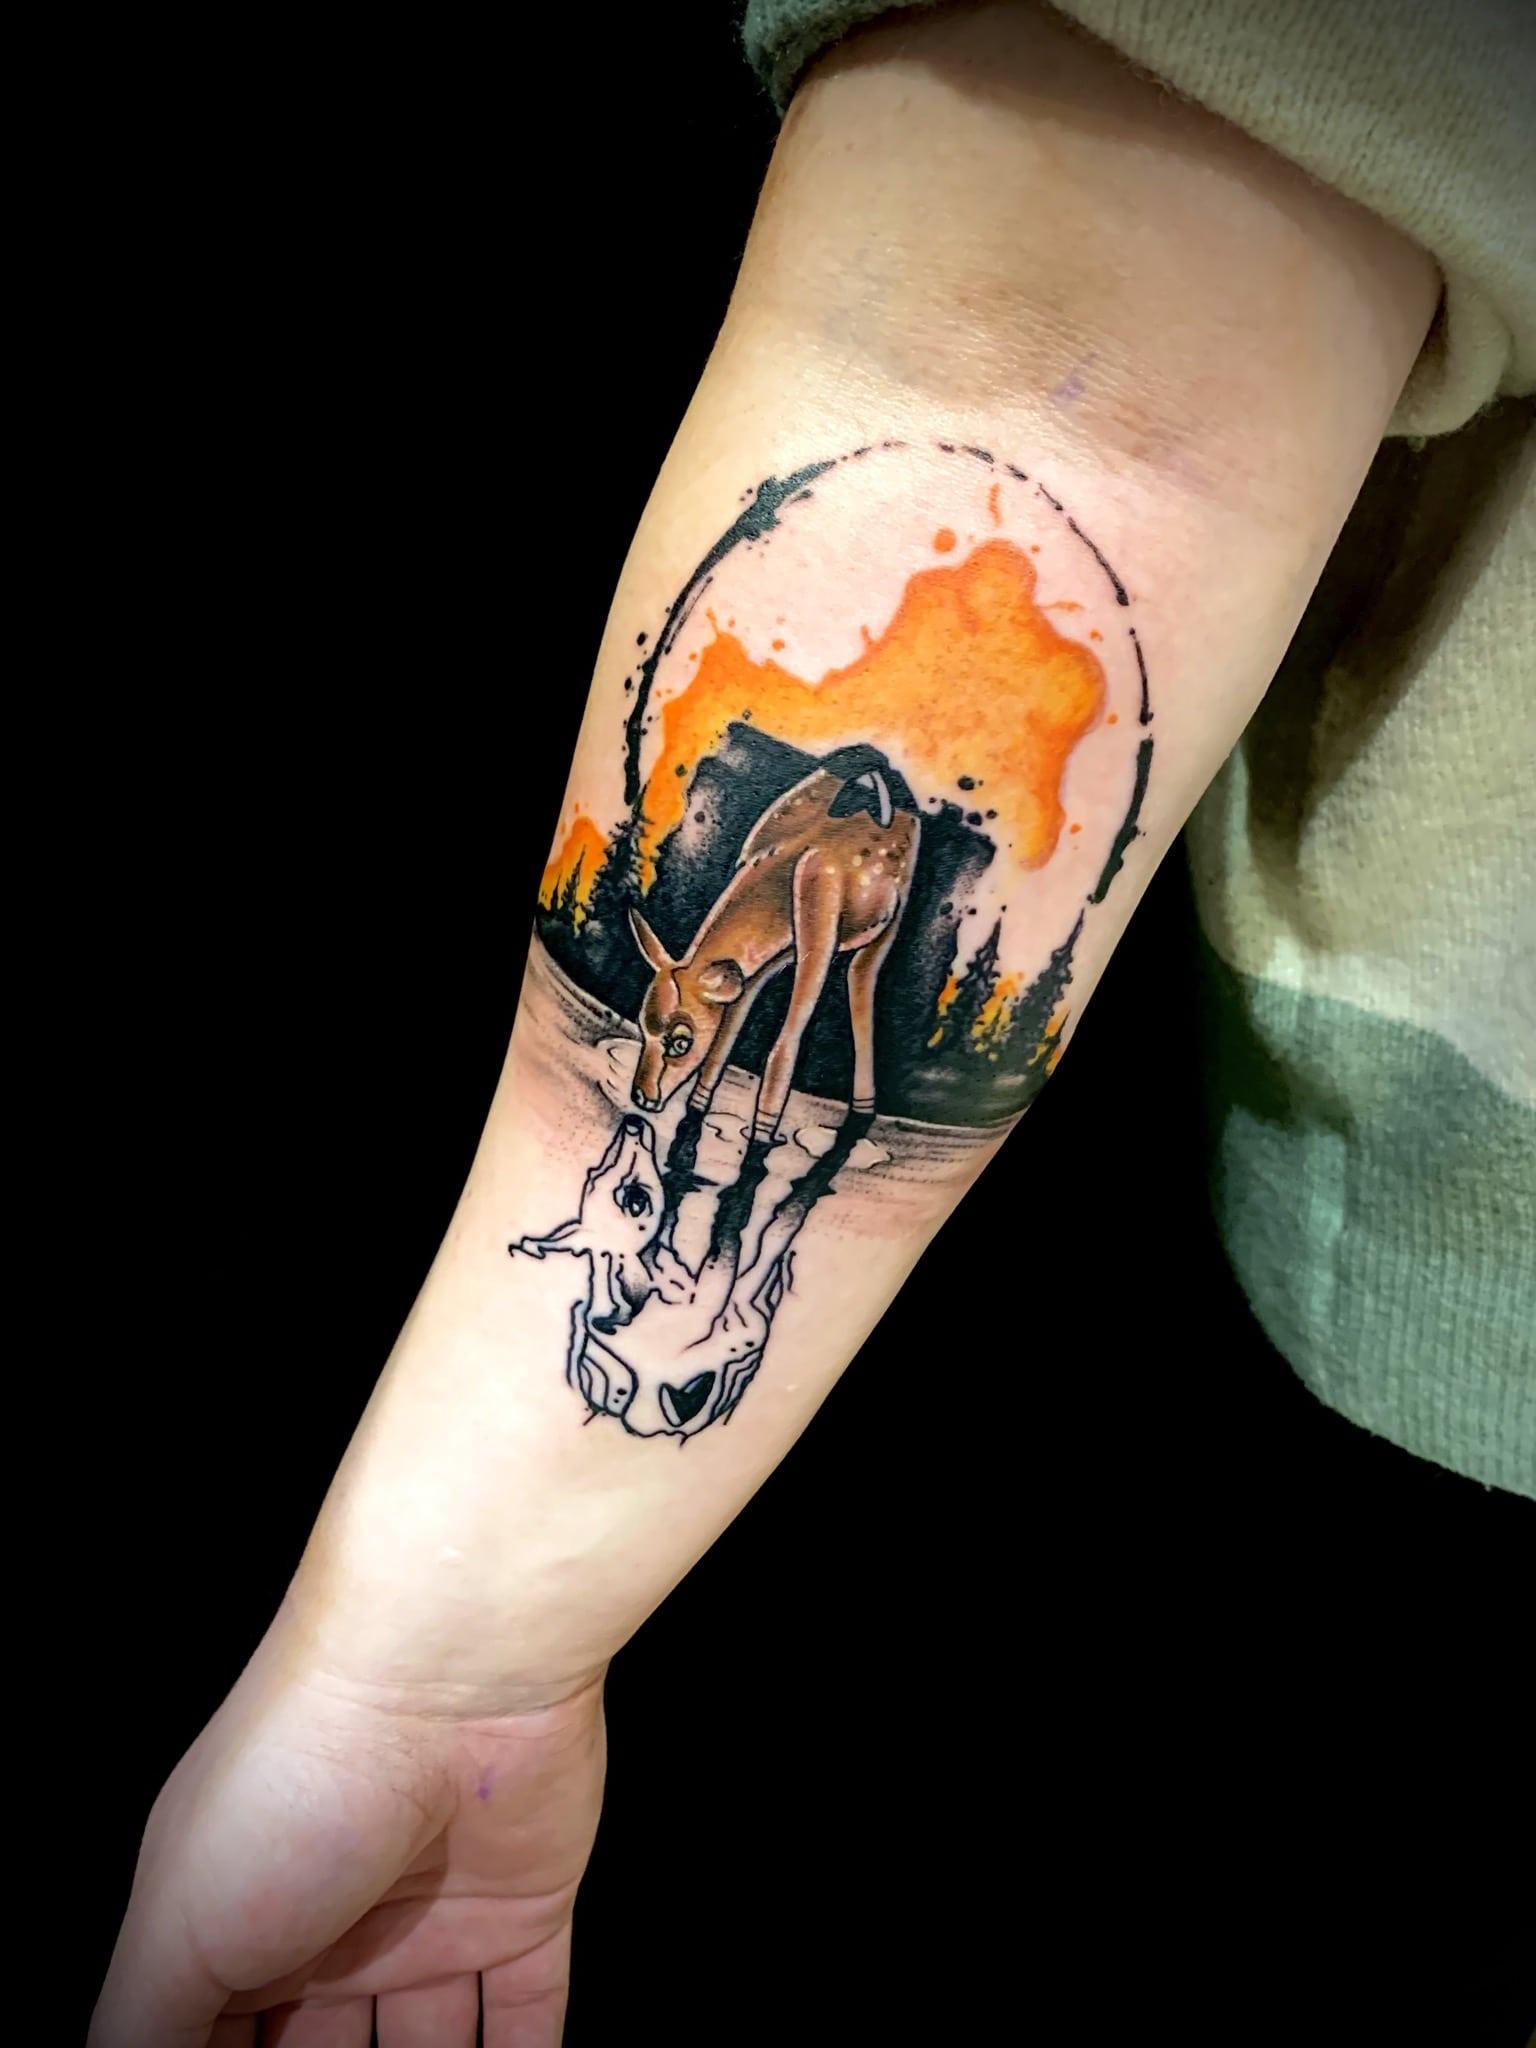 Tattoo Anansi München Artist David blackwork watercolor aquarell bambi forrest Wald